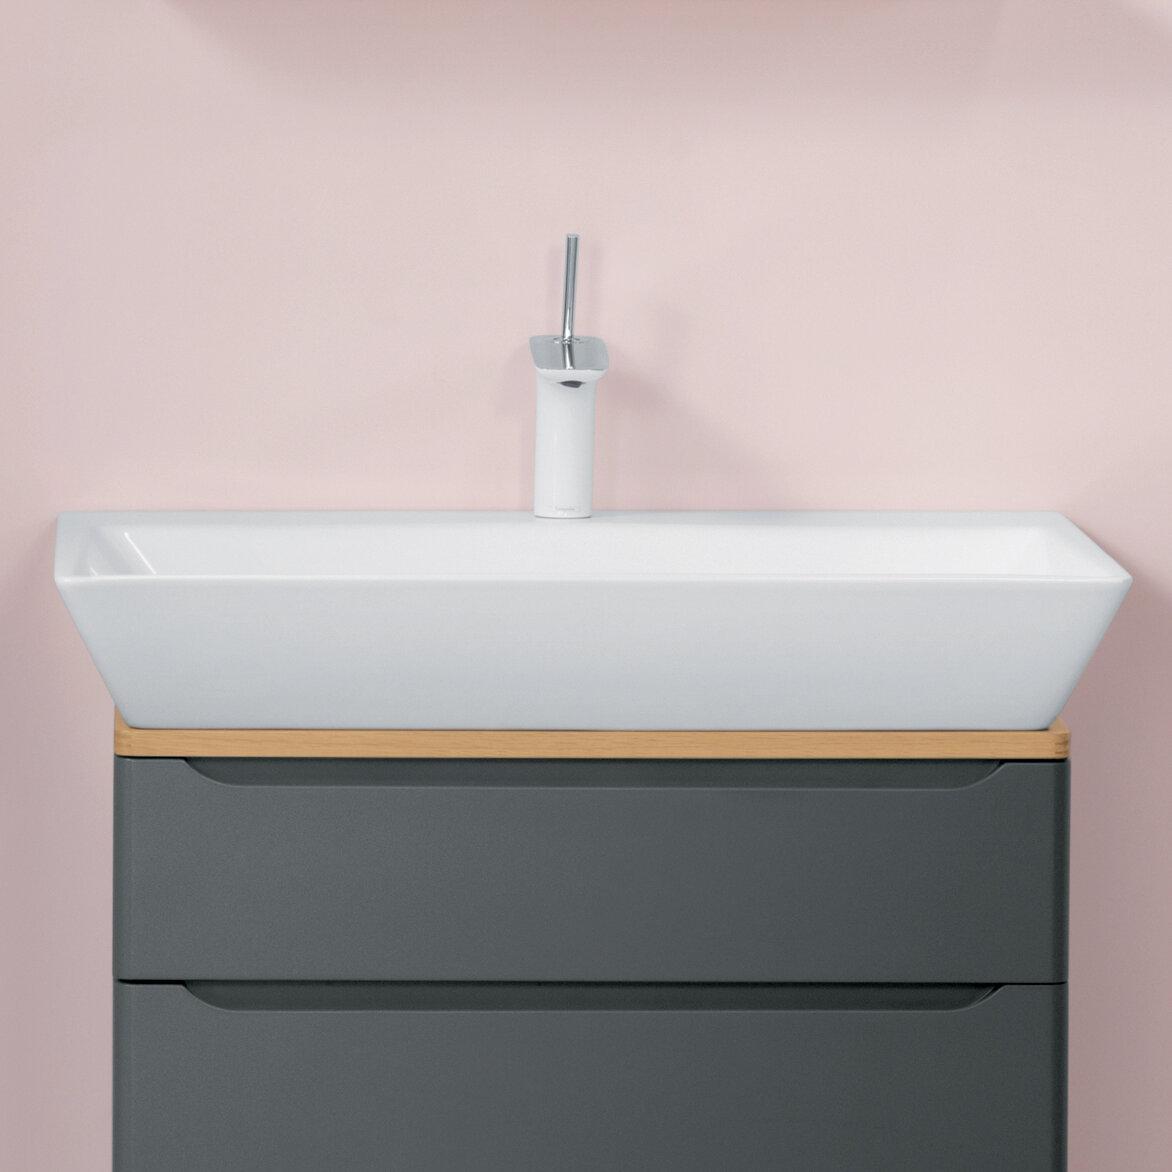 Merveilleux Ronbow Wide Ceramic Rectangular Vessel Bathroom Sink   Wayfair